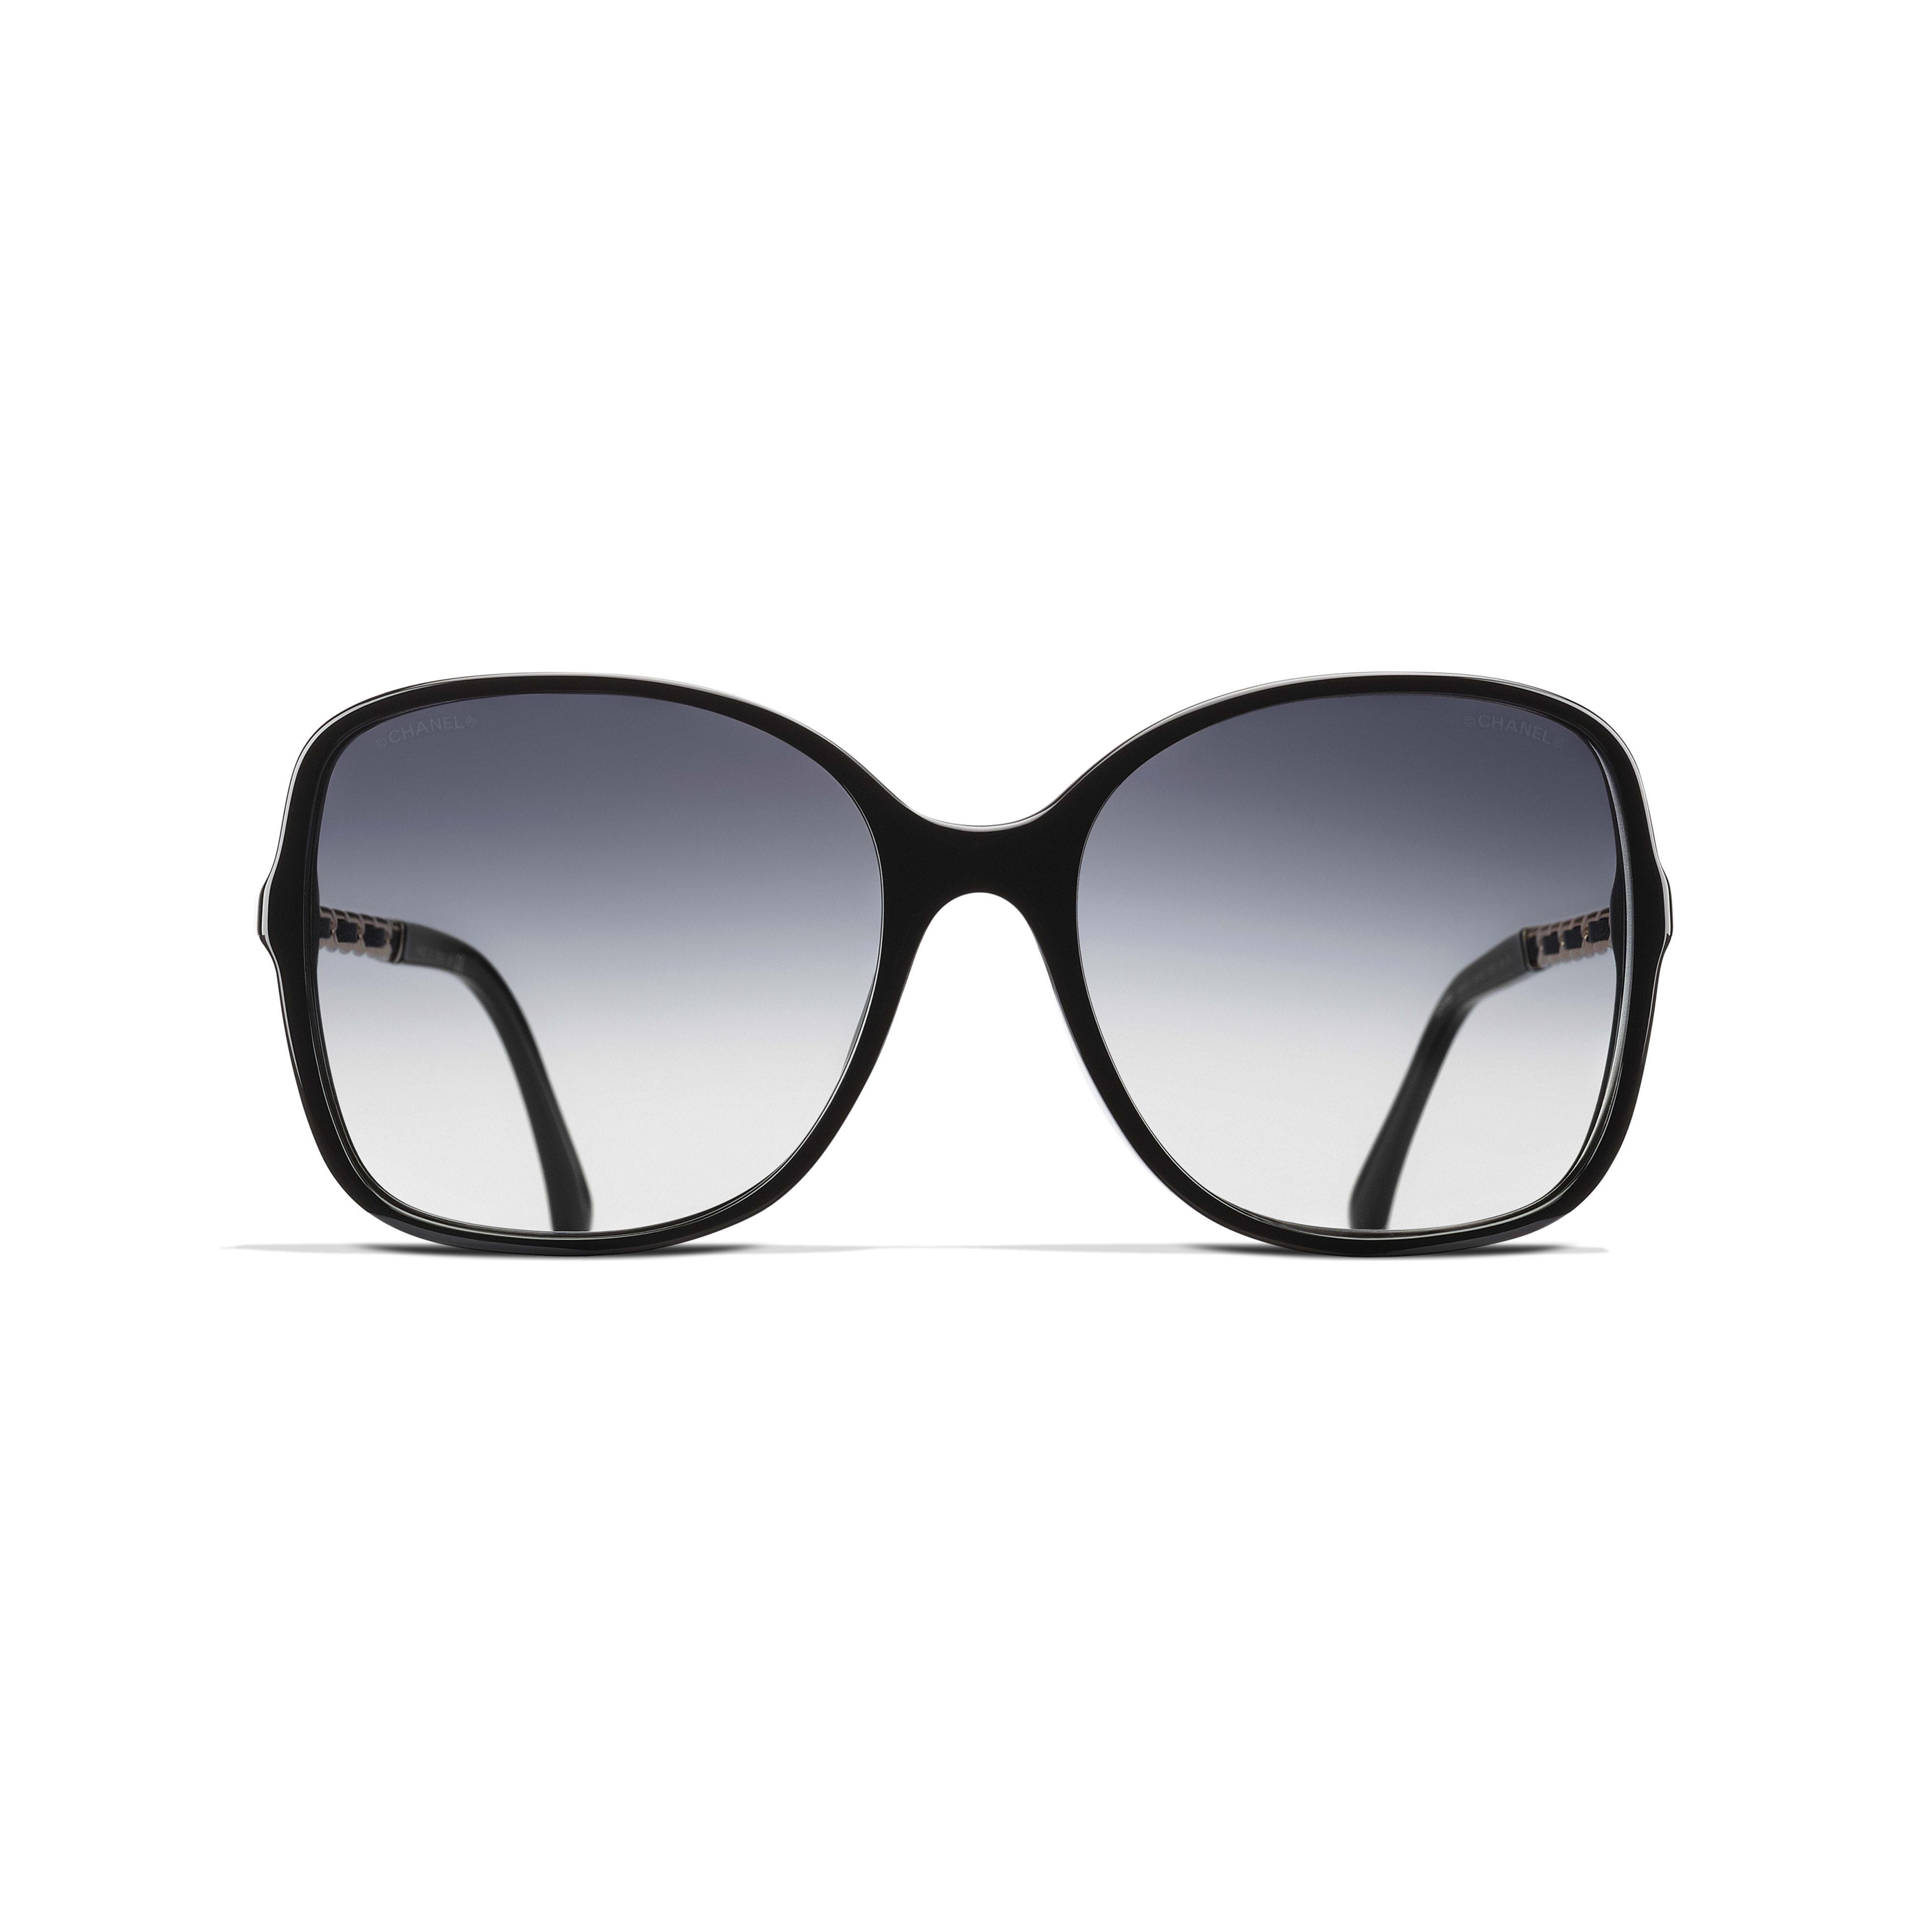 Square Sunglasses - Black - Acetate & Lambskin - Alternative view - see full sized version